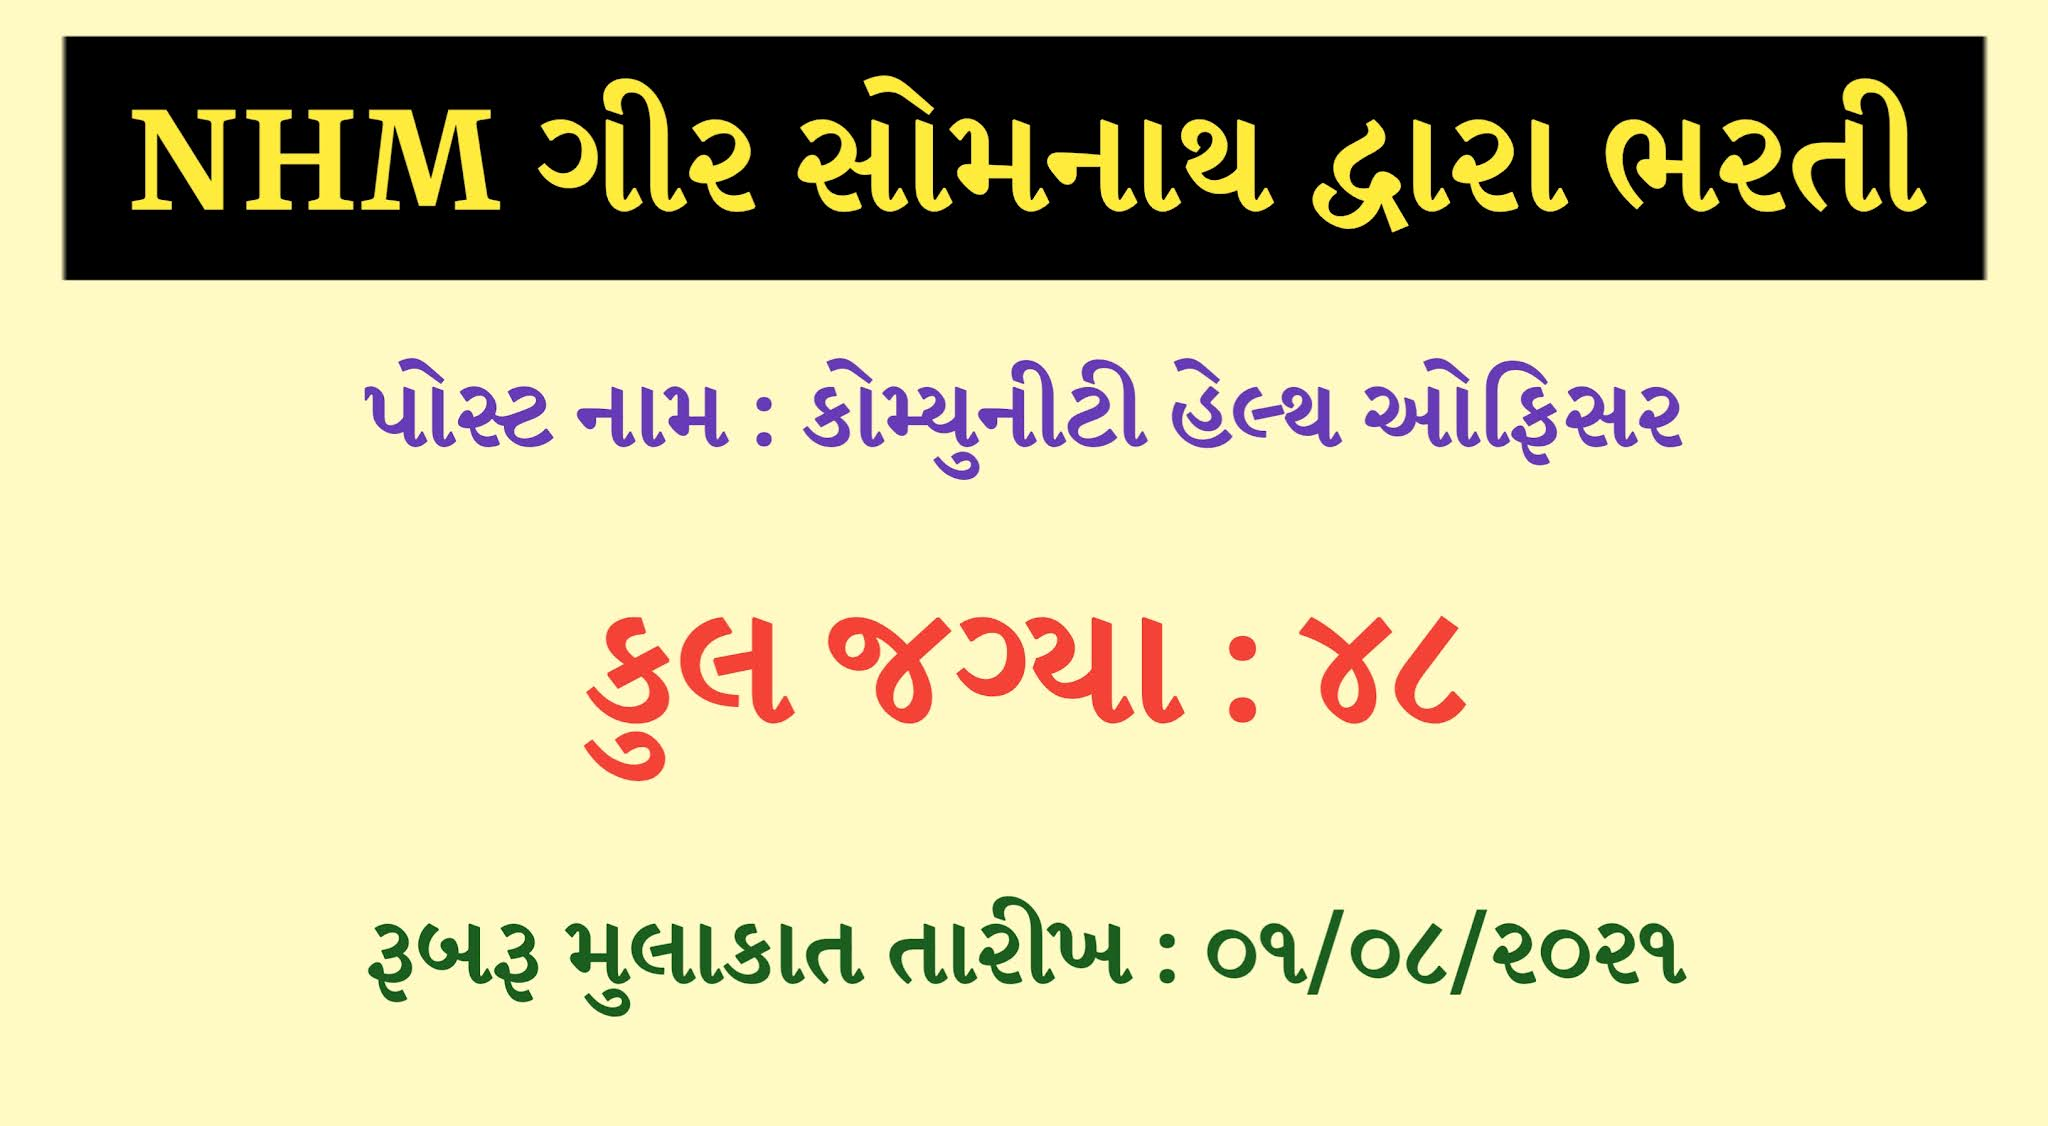 NHM Gir Somnath Recruitment Community Health Officer 2021, NHM Gir Somnath Recruitment 2021